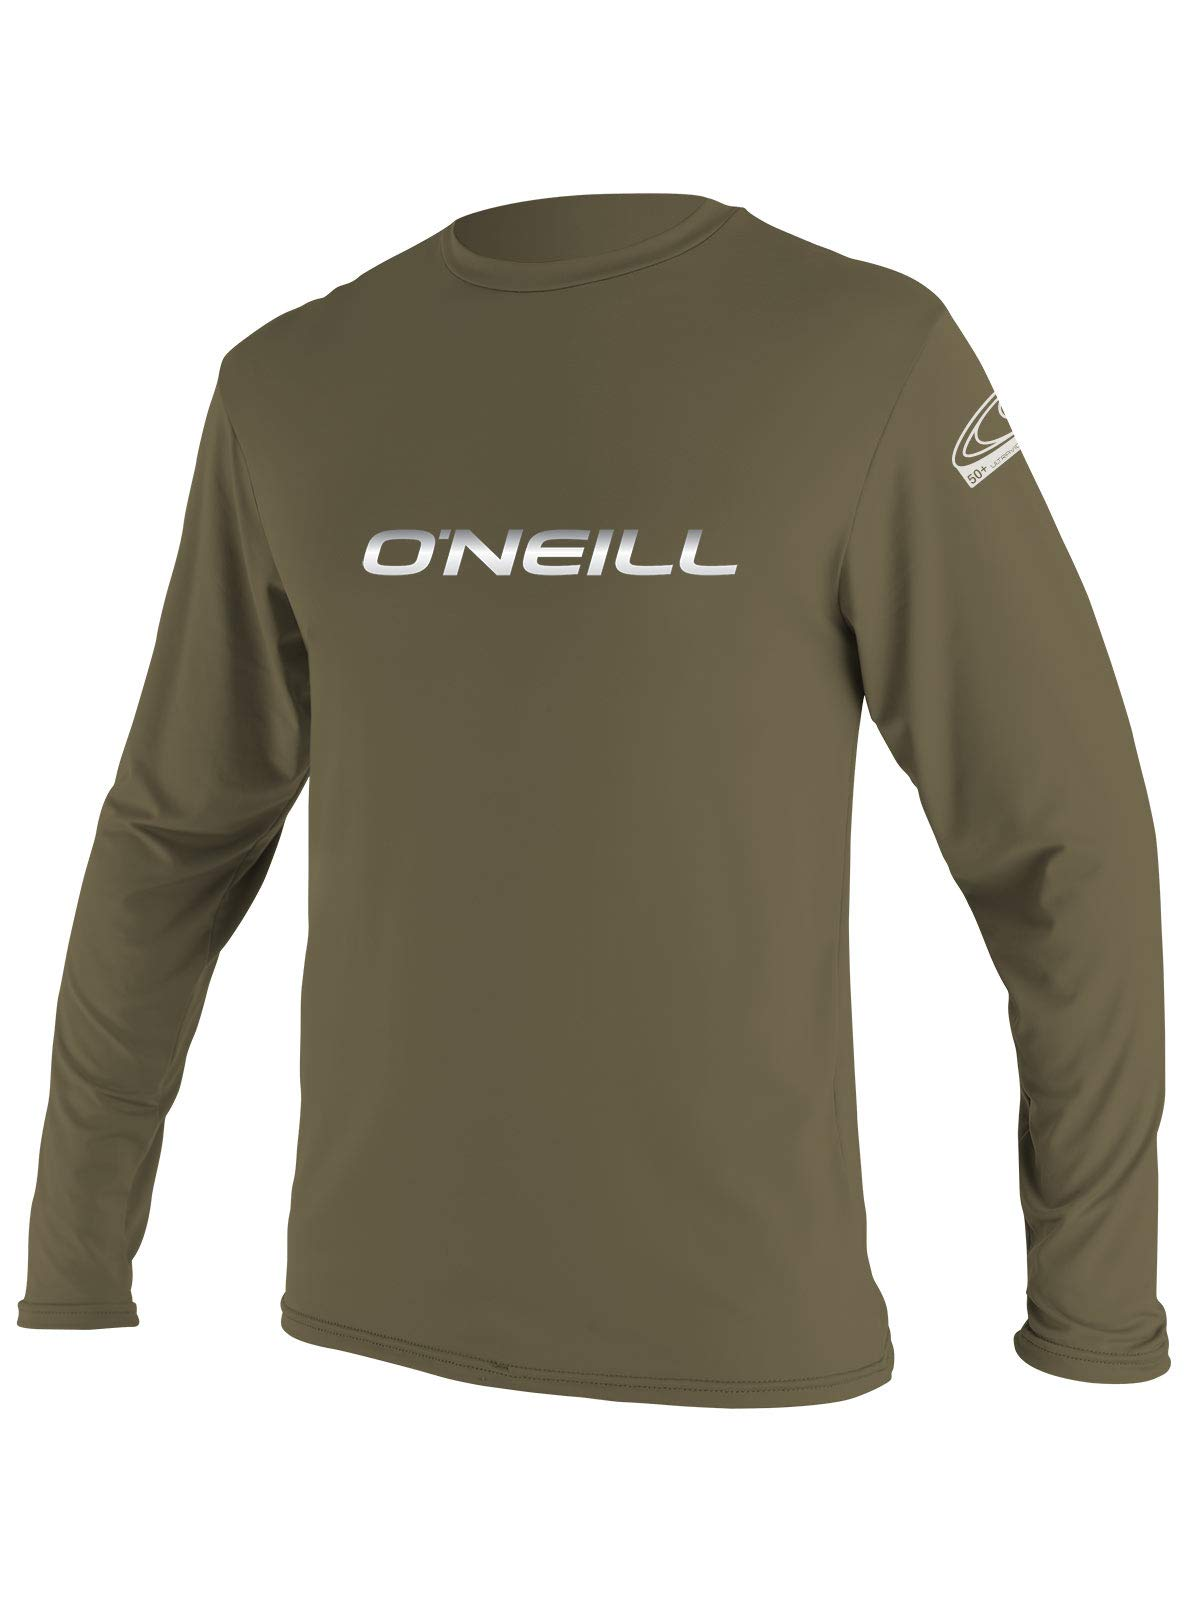 O'Neill Men's Longsleeve Basic Skins Rash Tee (Khaki, Medium) by O'Neill Wetsuits